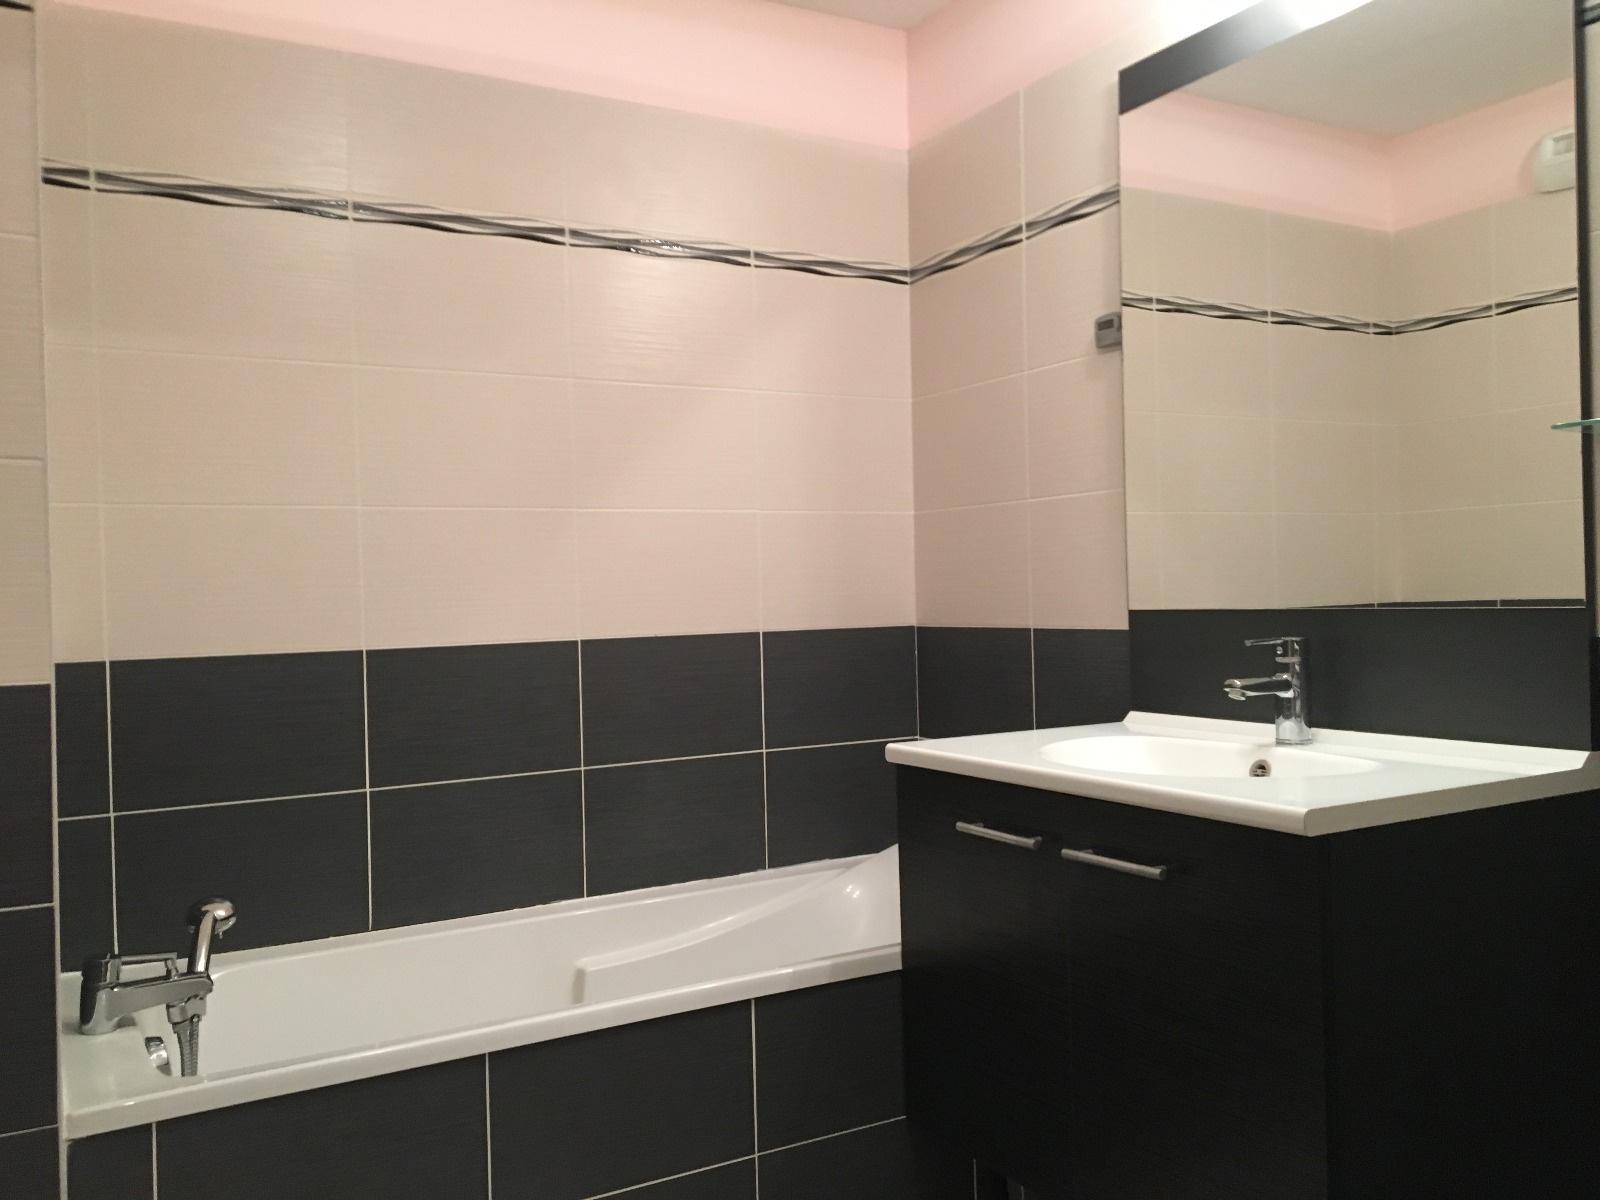 Salle de bains avec vasque